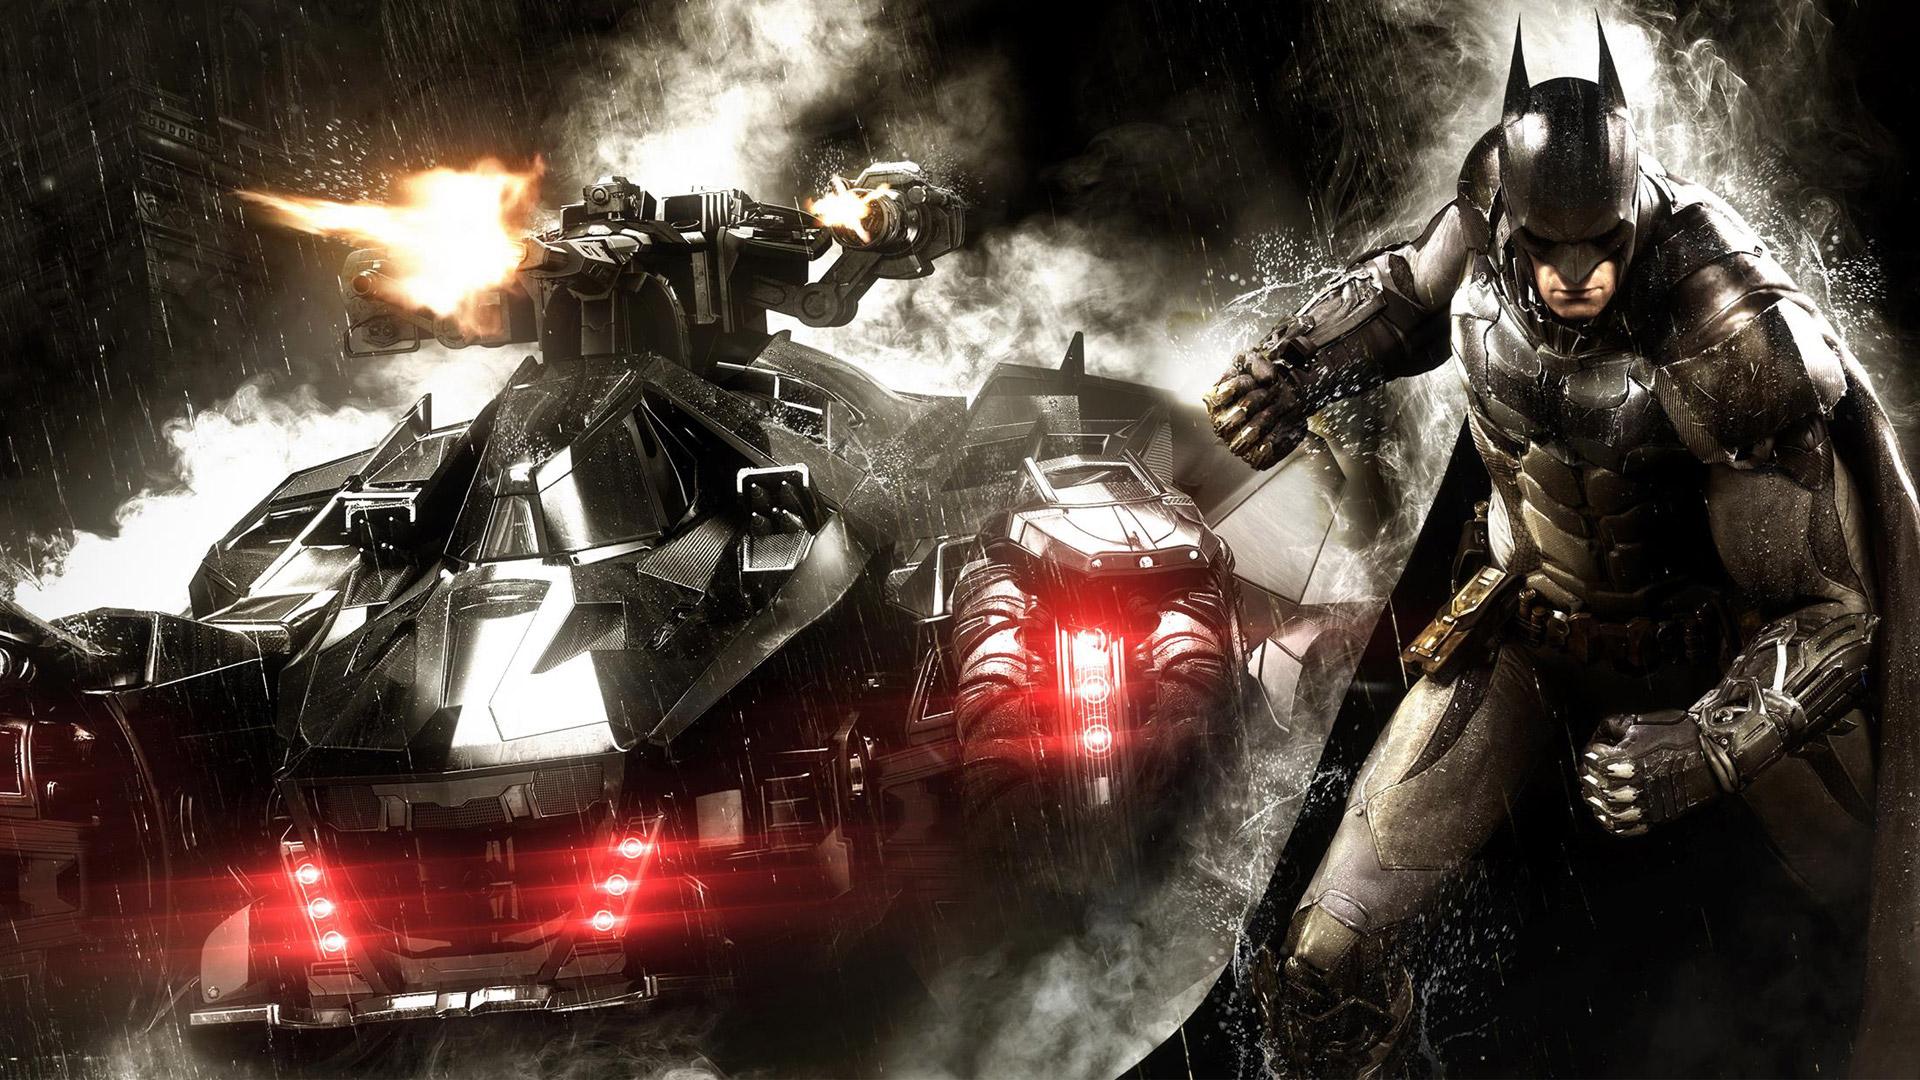 Batman Arkham Knight HD wallpapers free download